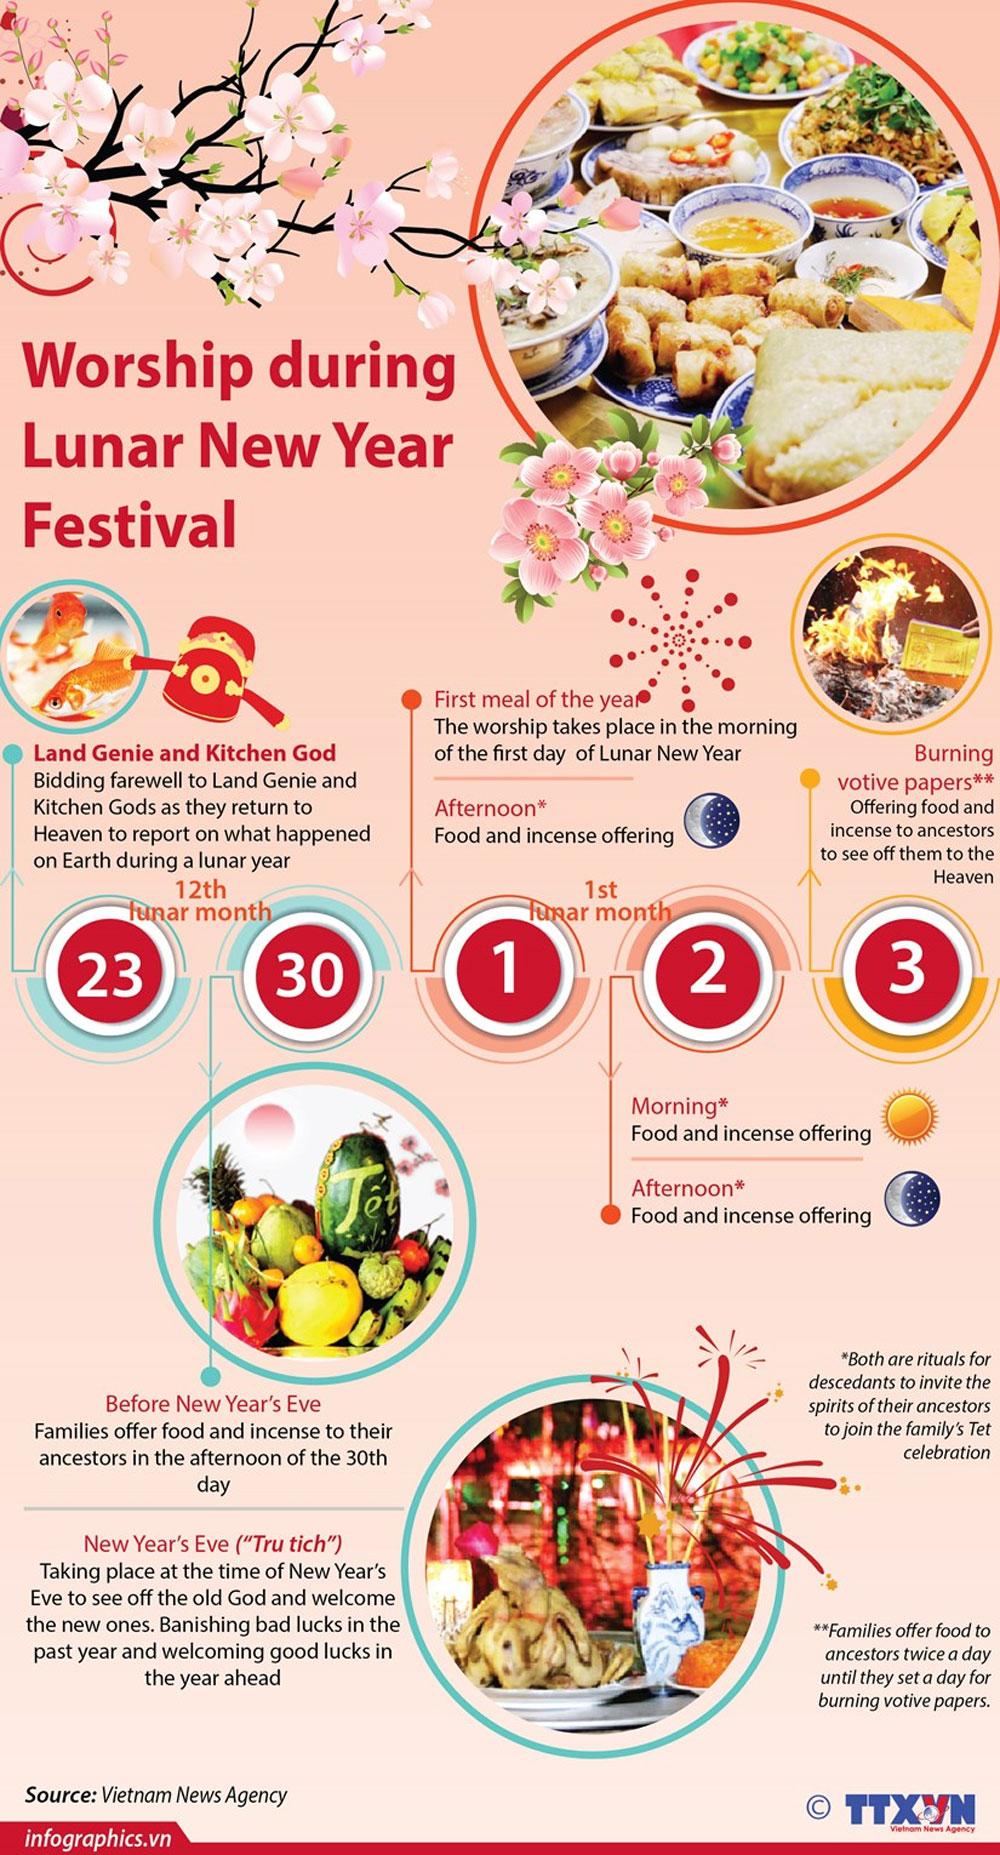 Worship, Lunar New Year Festival, Ancestor worship, traditional holiday